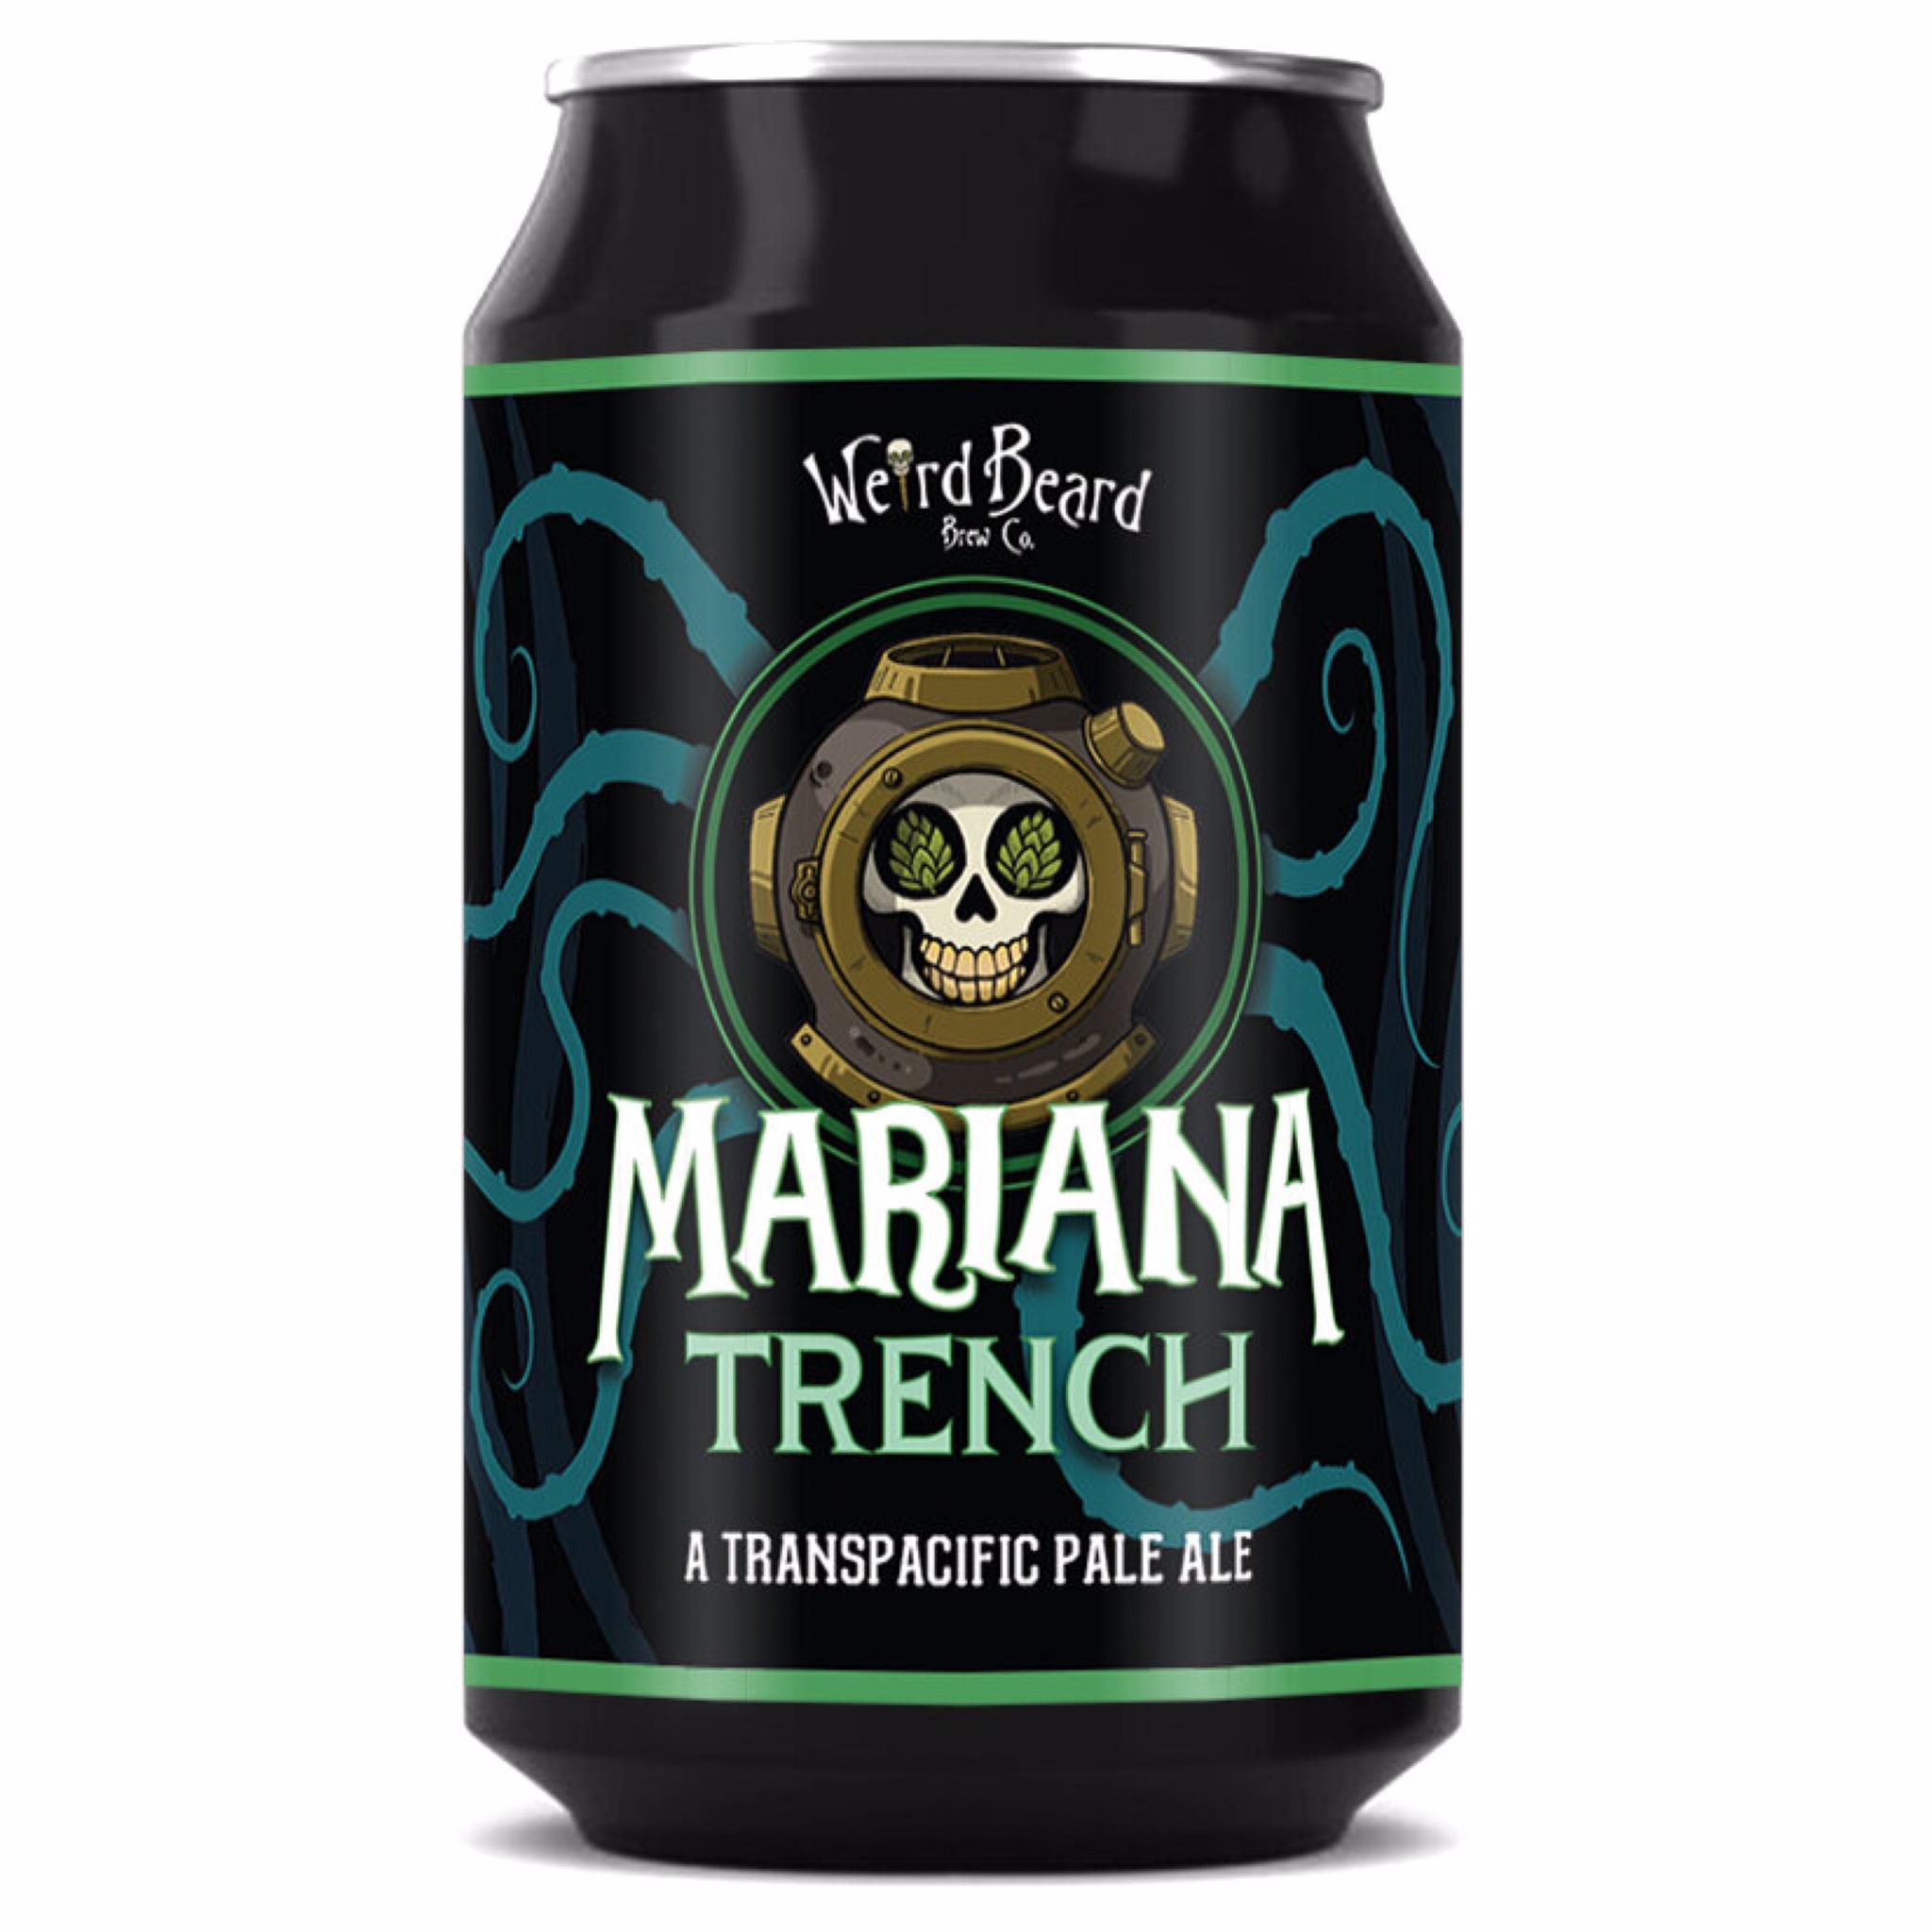 Mariana Trench Transpacific Pale Ale 5.3% 330ml Weird Beard Brew Co